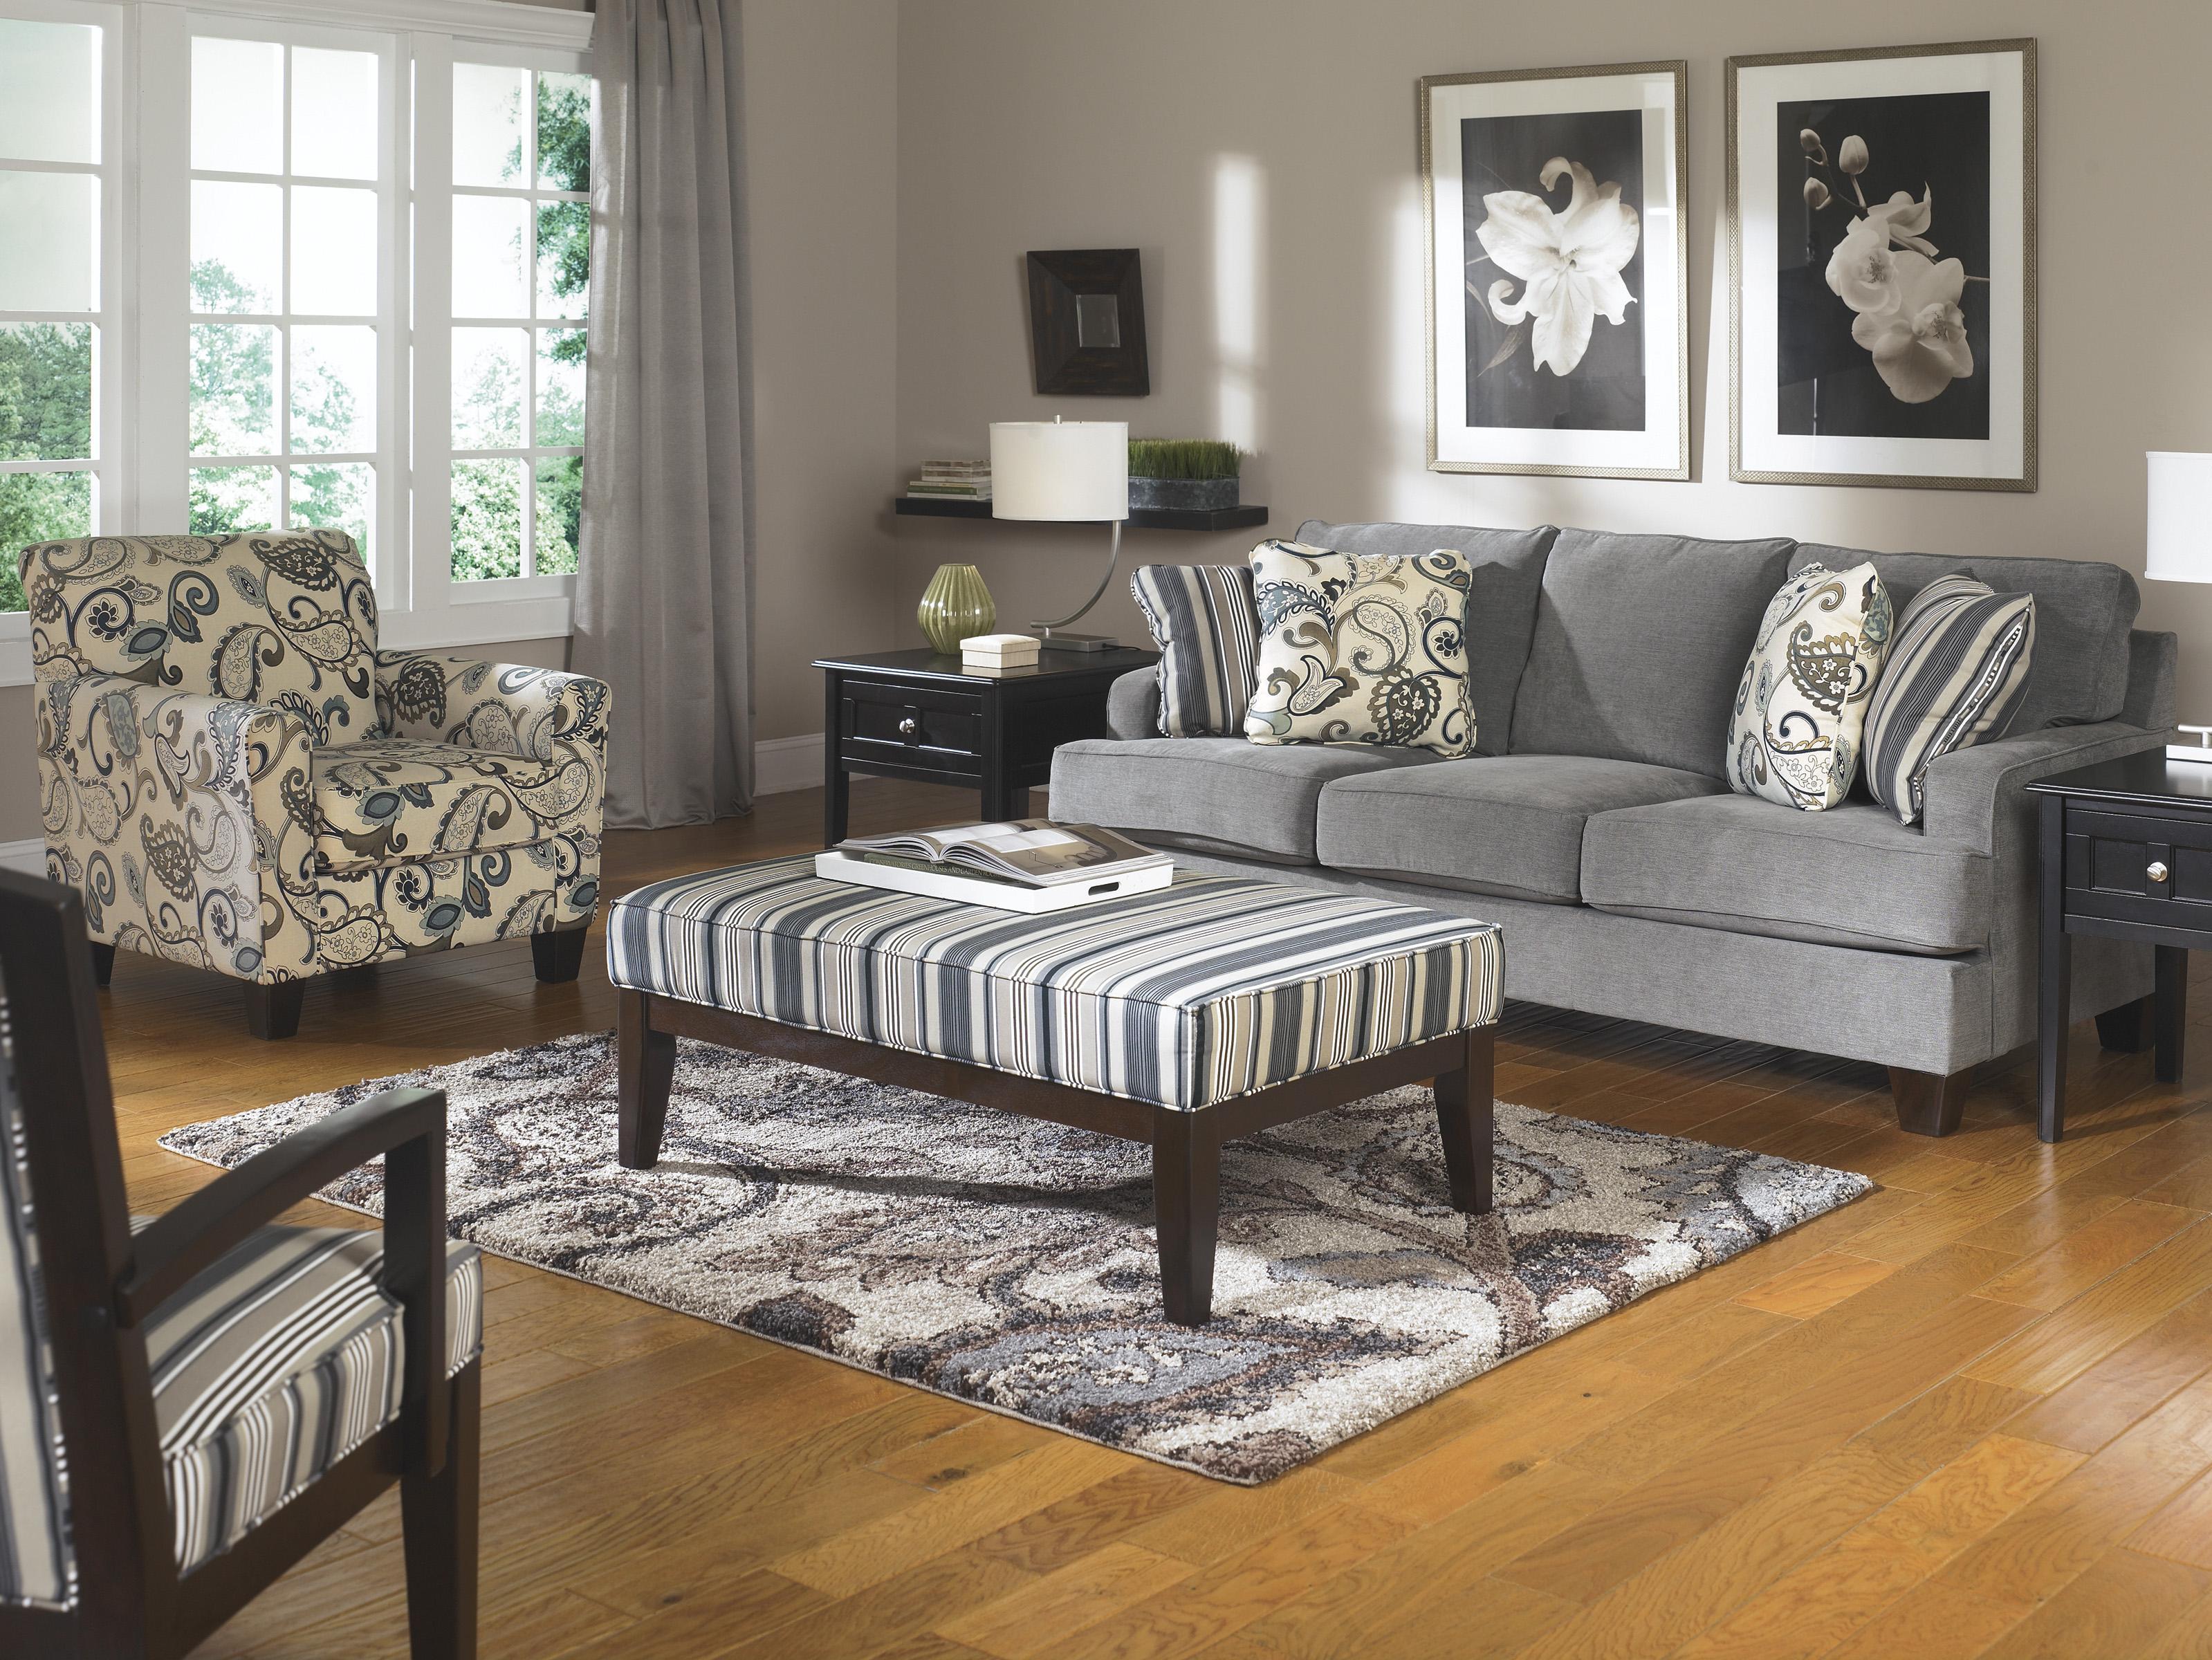 Ashley Furniture Yvette - Steel Stationary Living Room Group - Item Number: 77900 Living Room Group 4